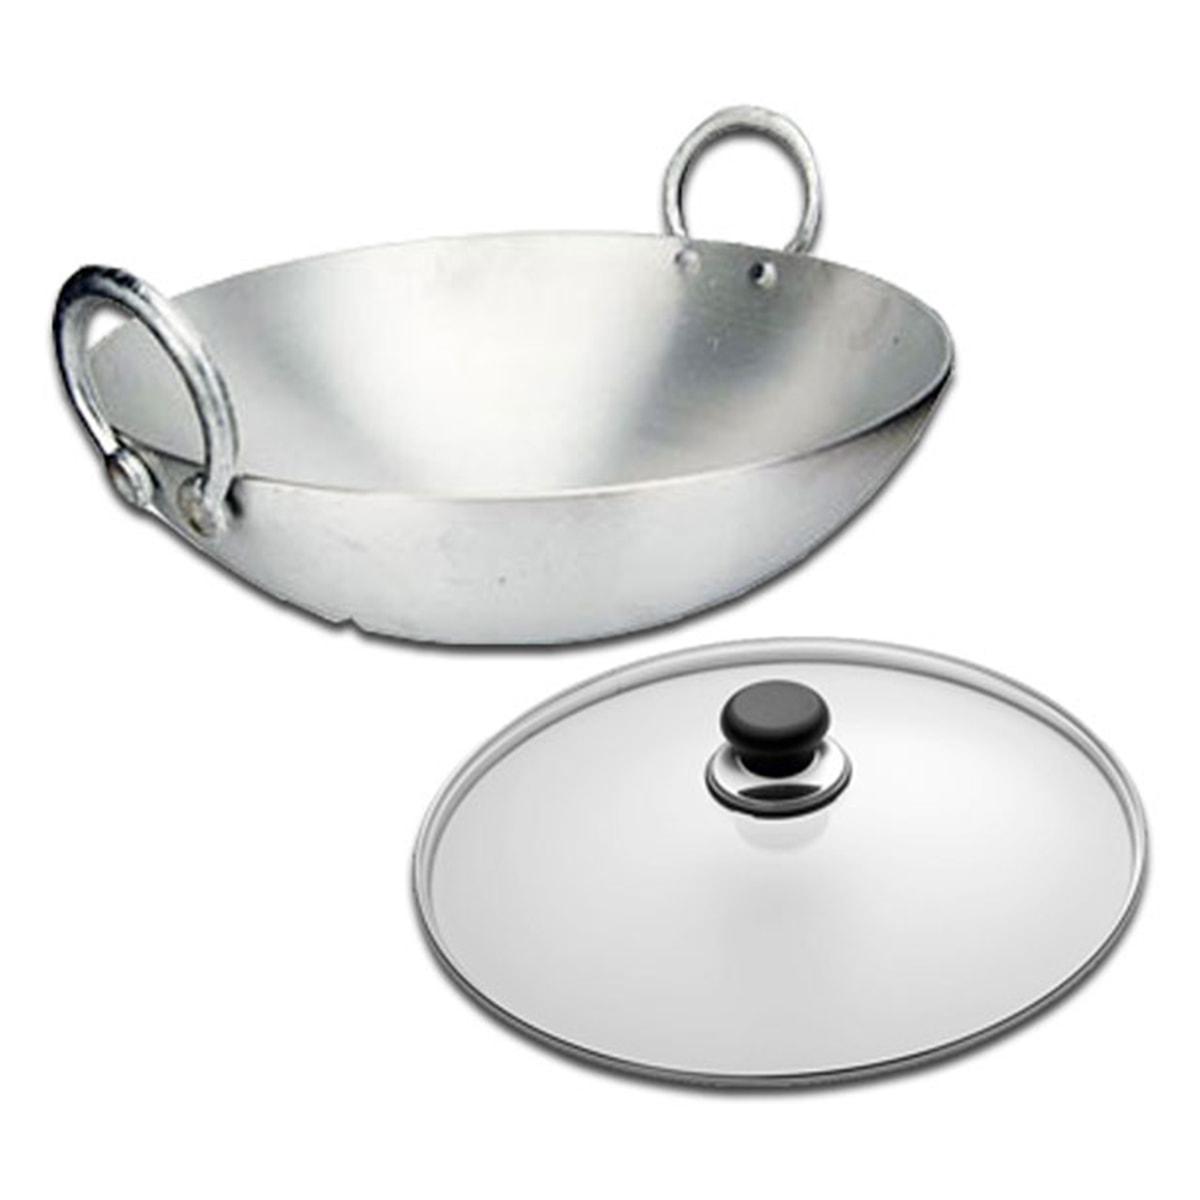 Buy IAG Products Cooking Utensils Wok (Aluminium Kadai) with Lid [large] - 2.5 kg